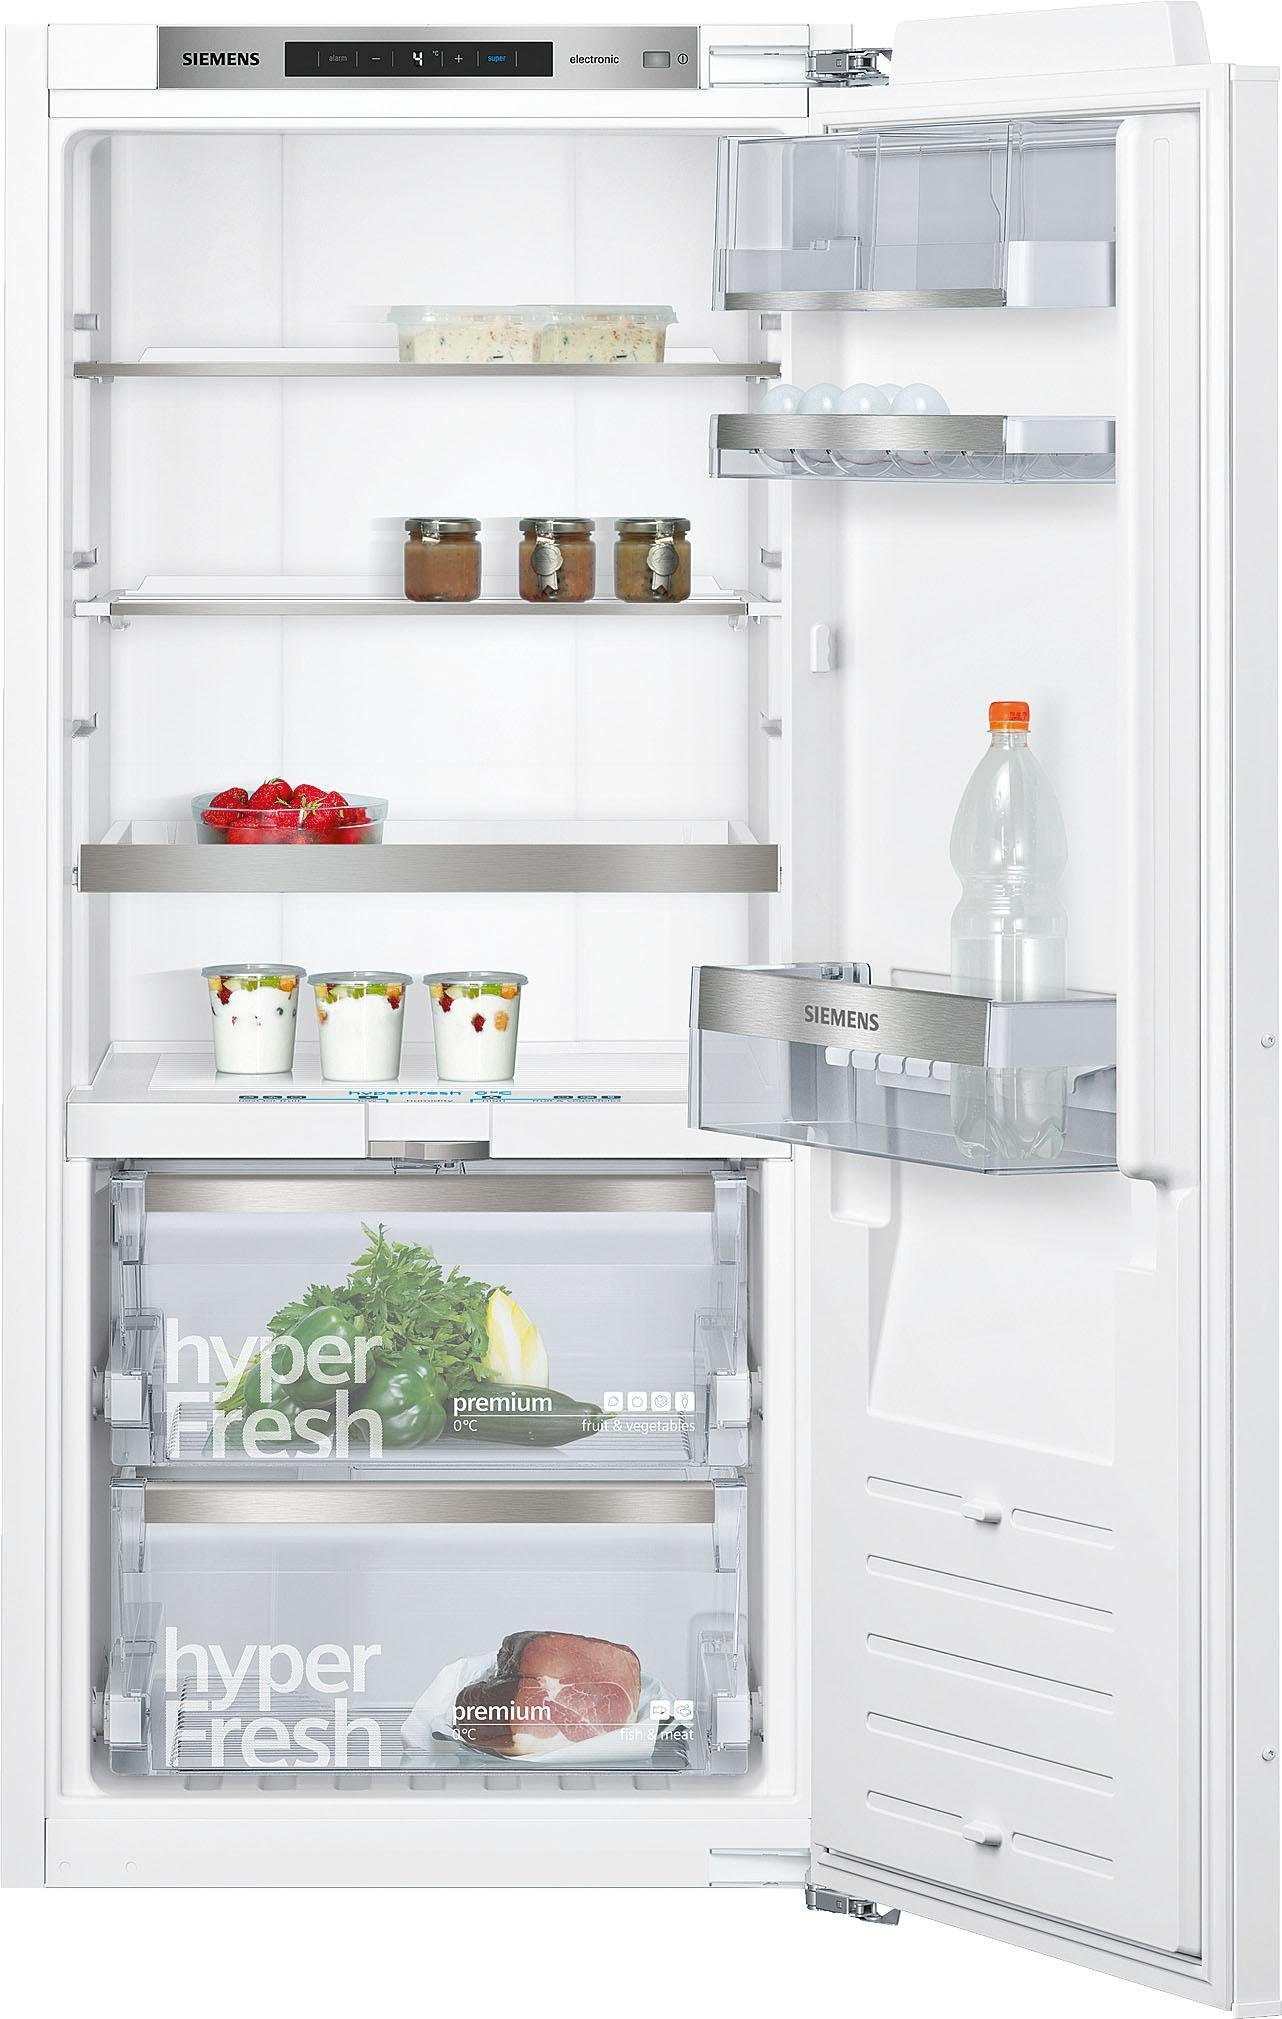 SIEMENS Einbaukühlschrank KI41FAD30, 122,1 cm hoch, 55,8 cm breit, A++, 122,1 cm hoch, integrierbar